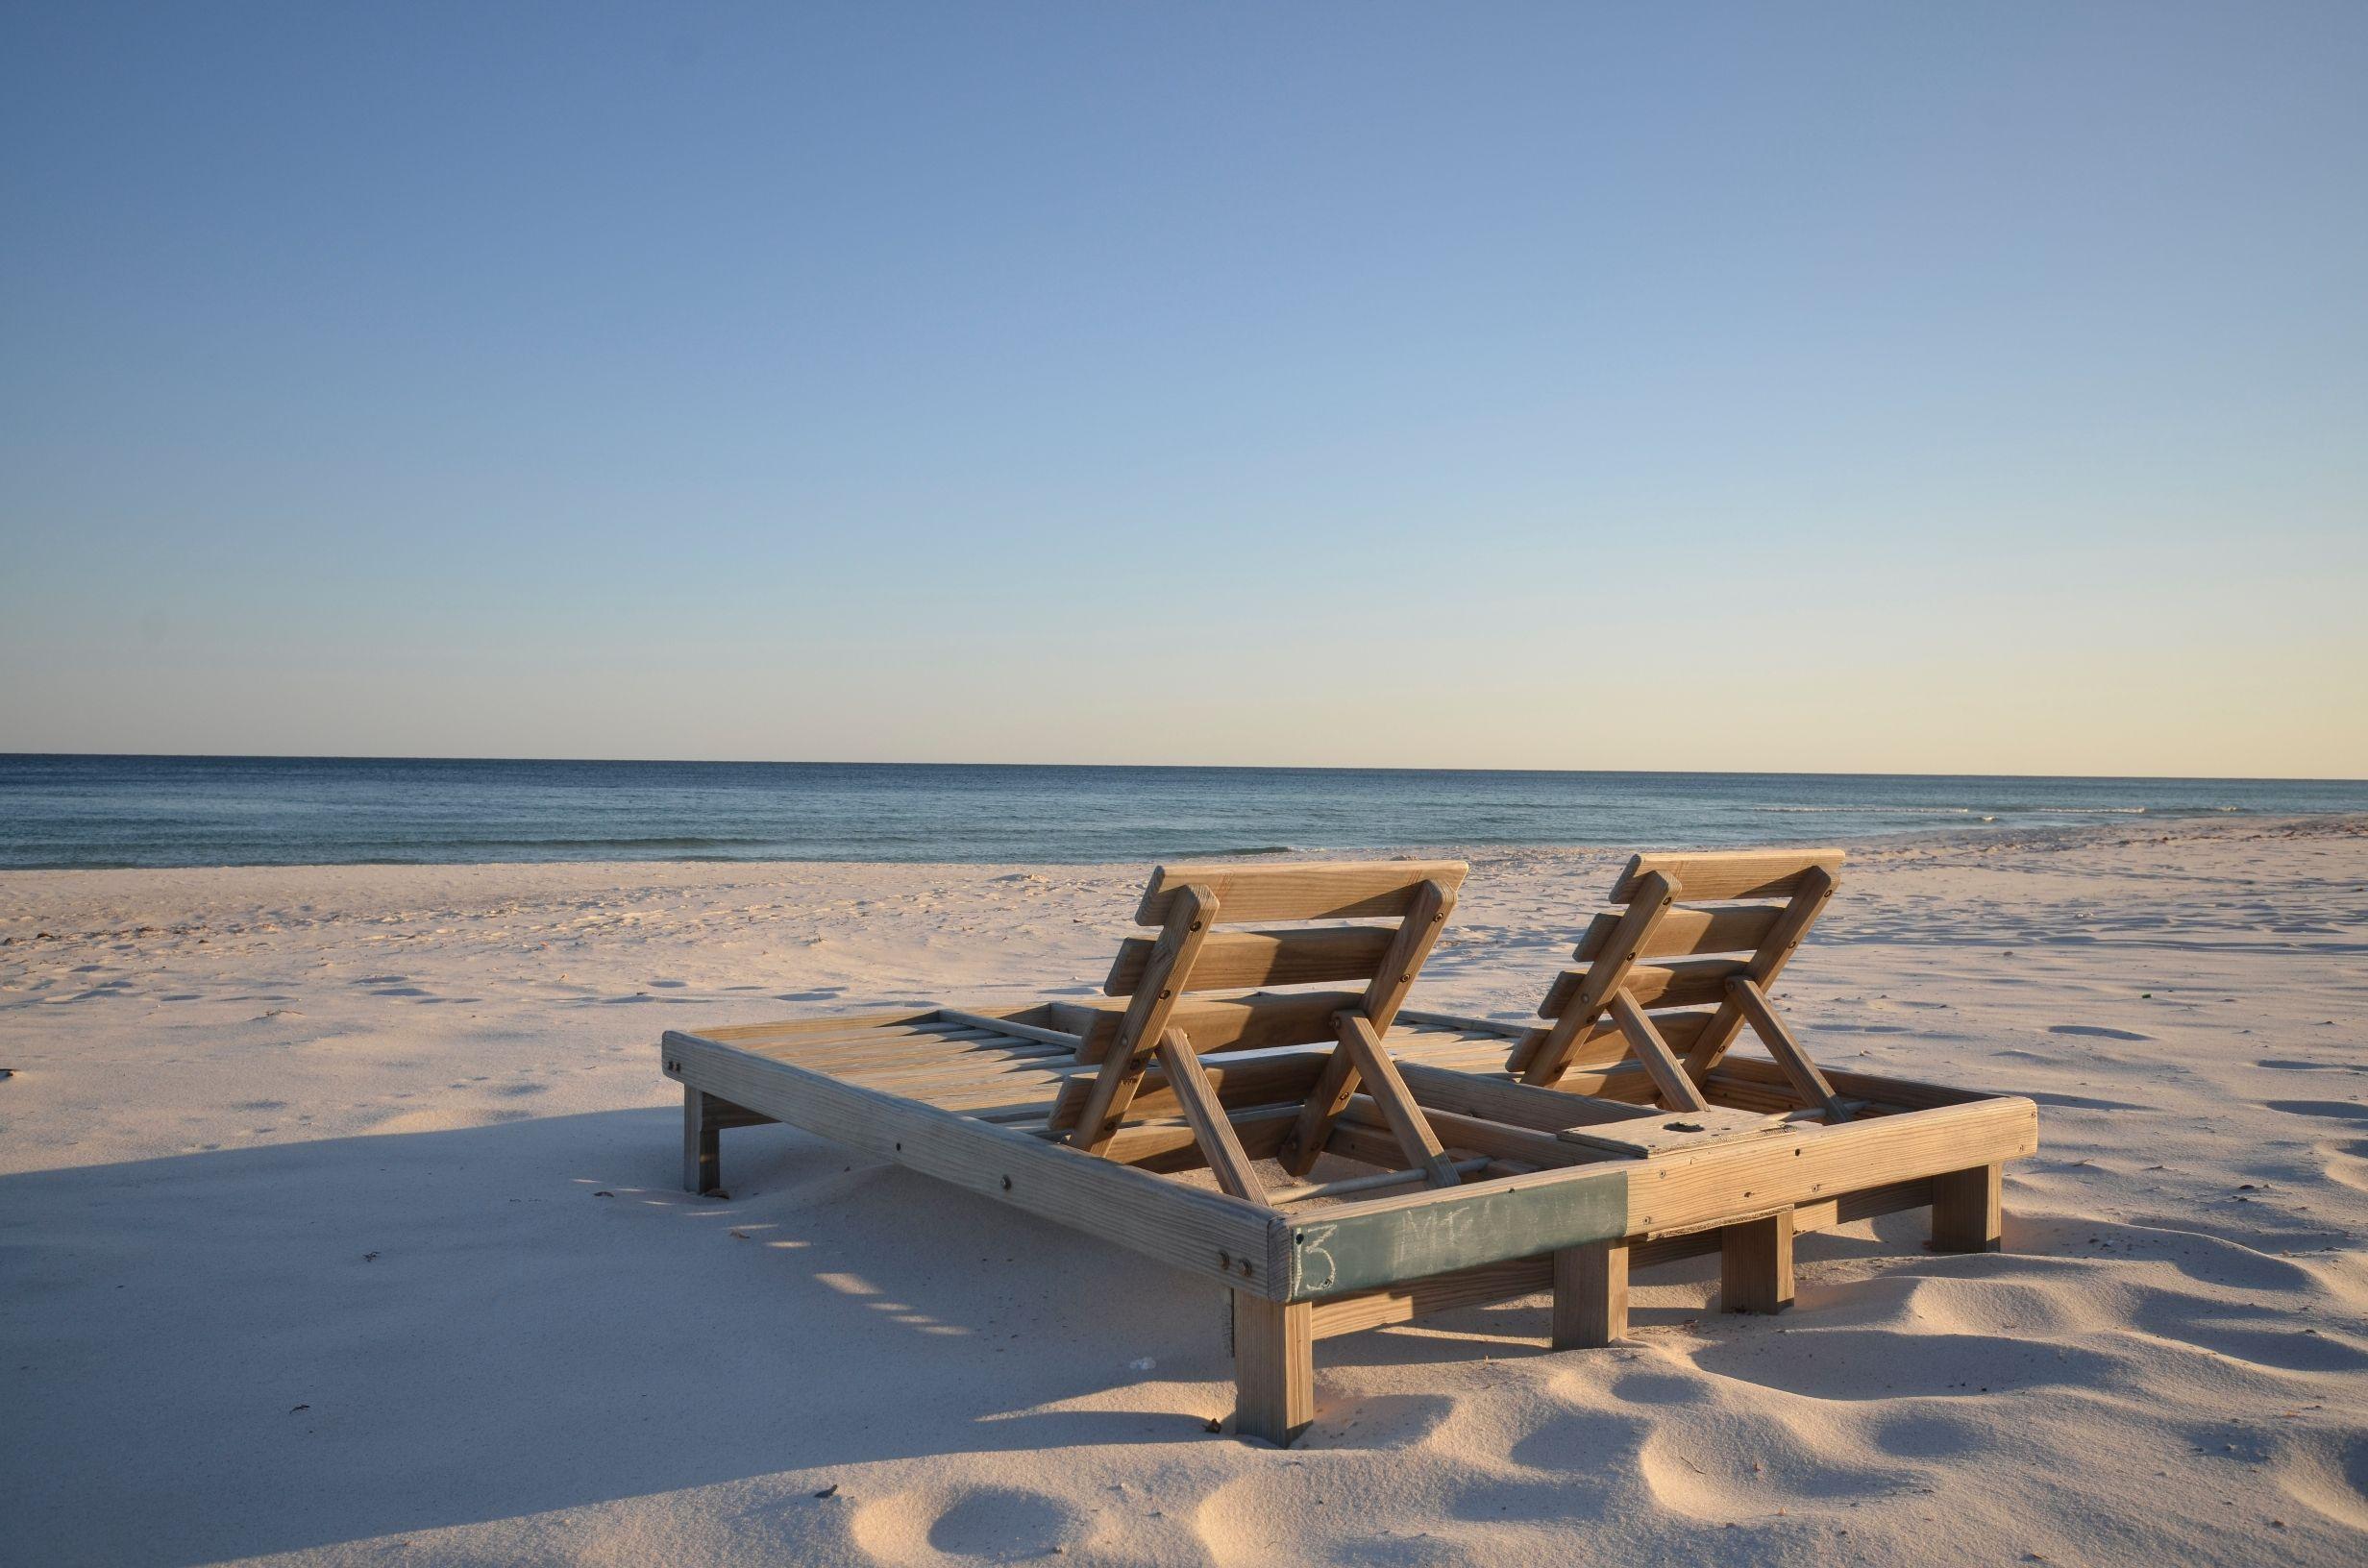 Beach Adjustable Backrest - 1dd95f9c4986d6f210b8289545b8b65f_Best Beach Adjustable Backrest - 1dd95f9c4986d6f210b8289545b8b65f  Snapshot_766575.jpg